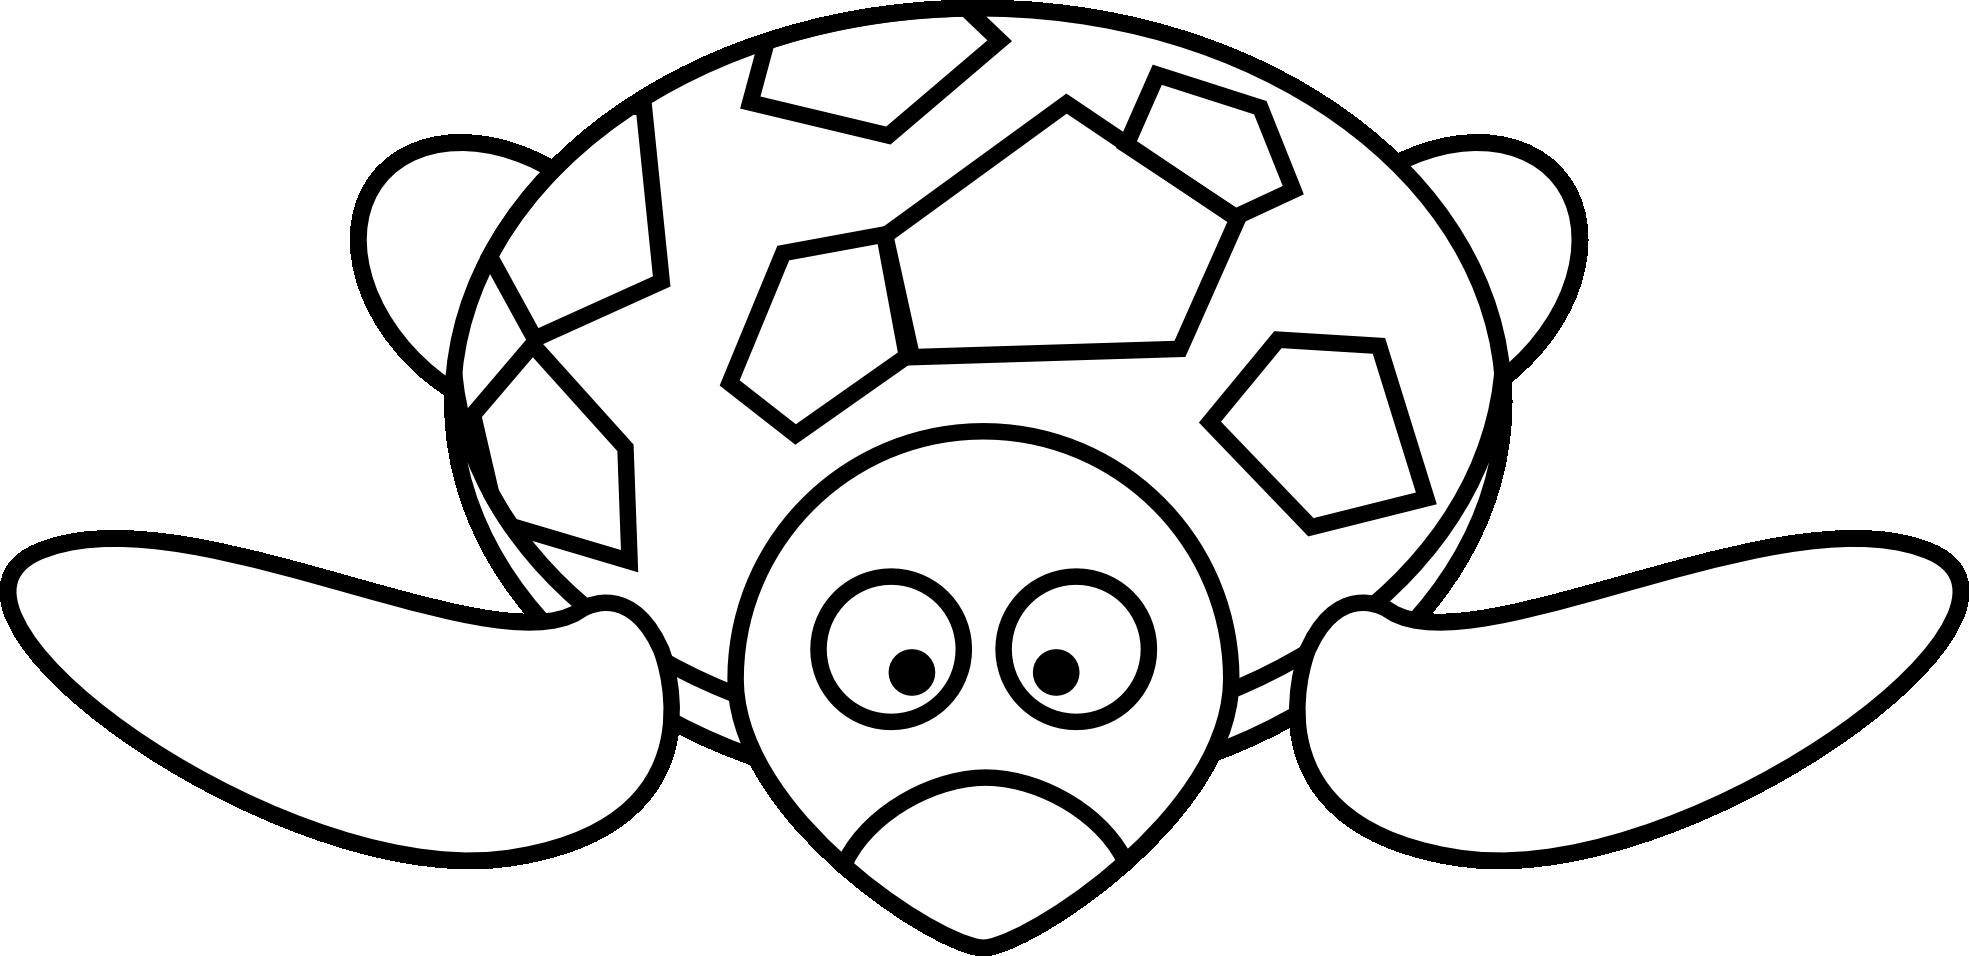 Coloriage tortue facile